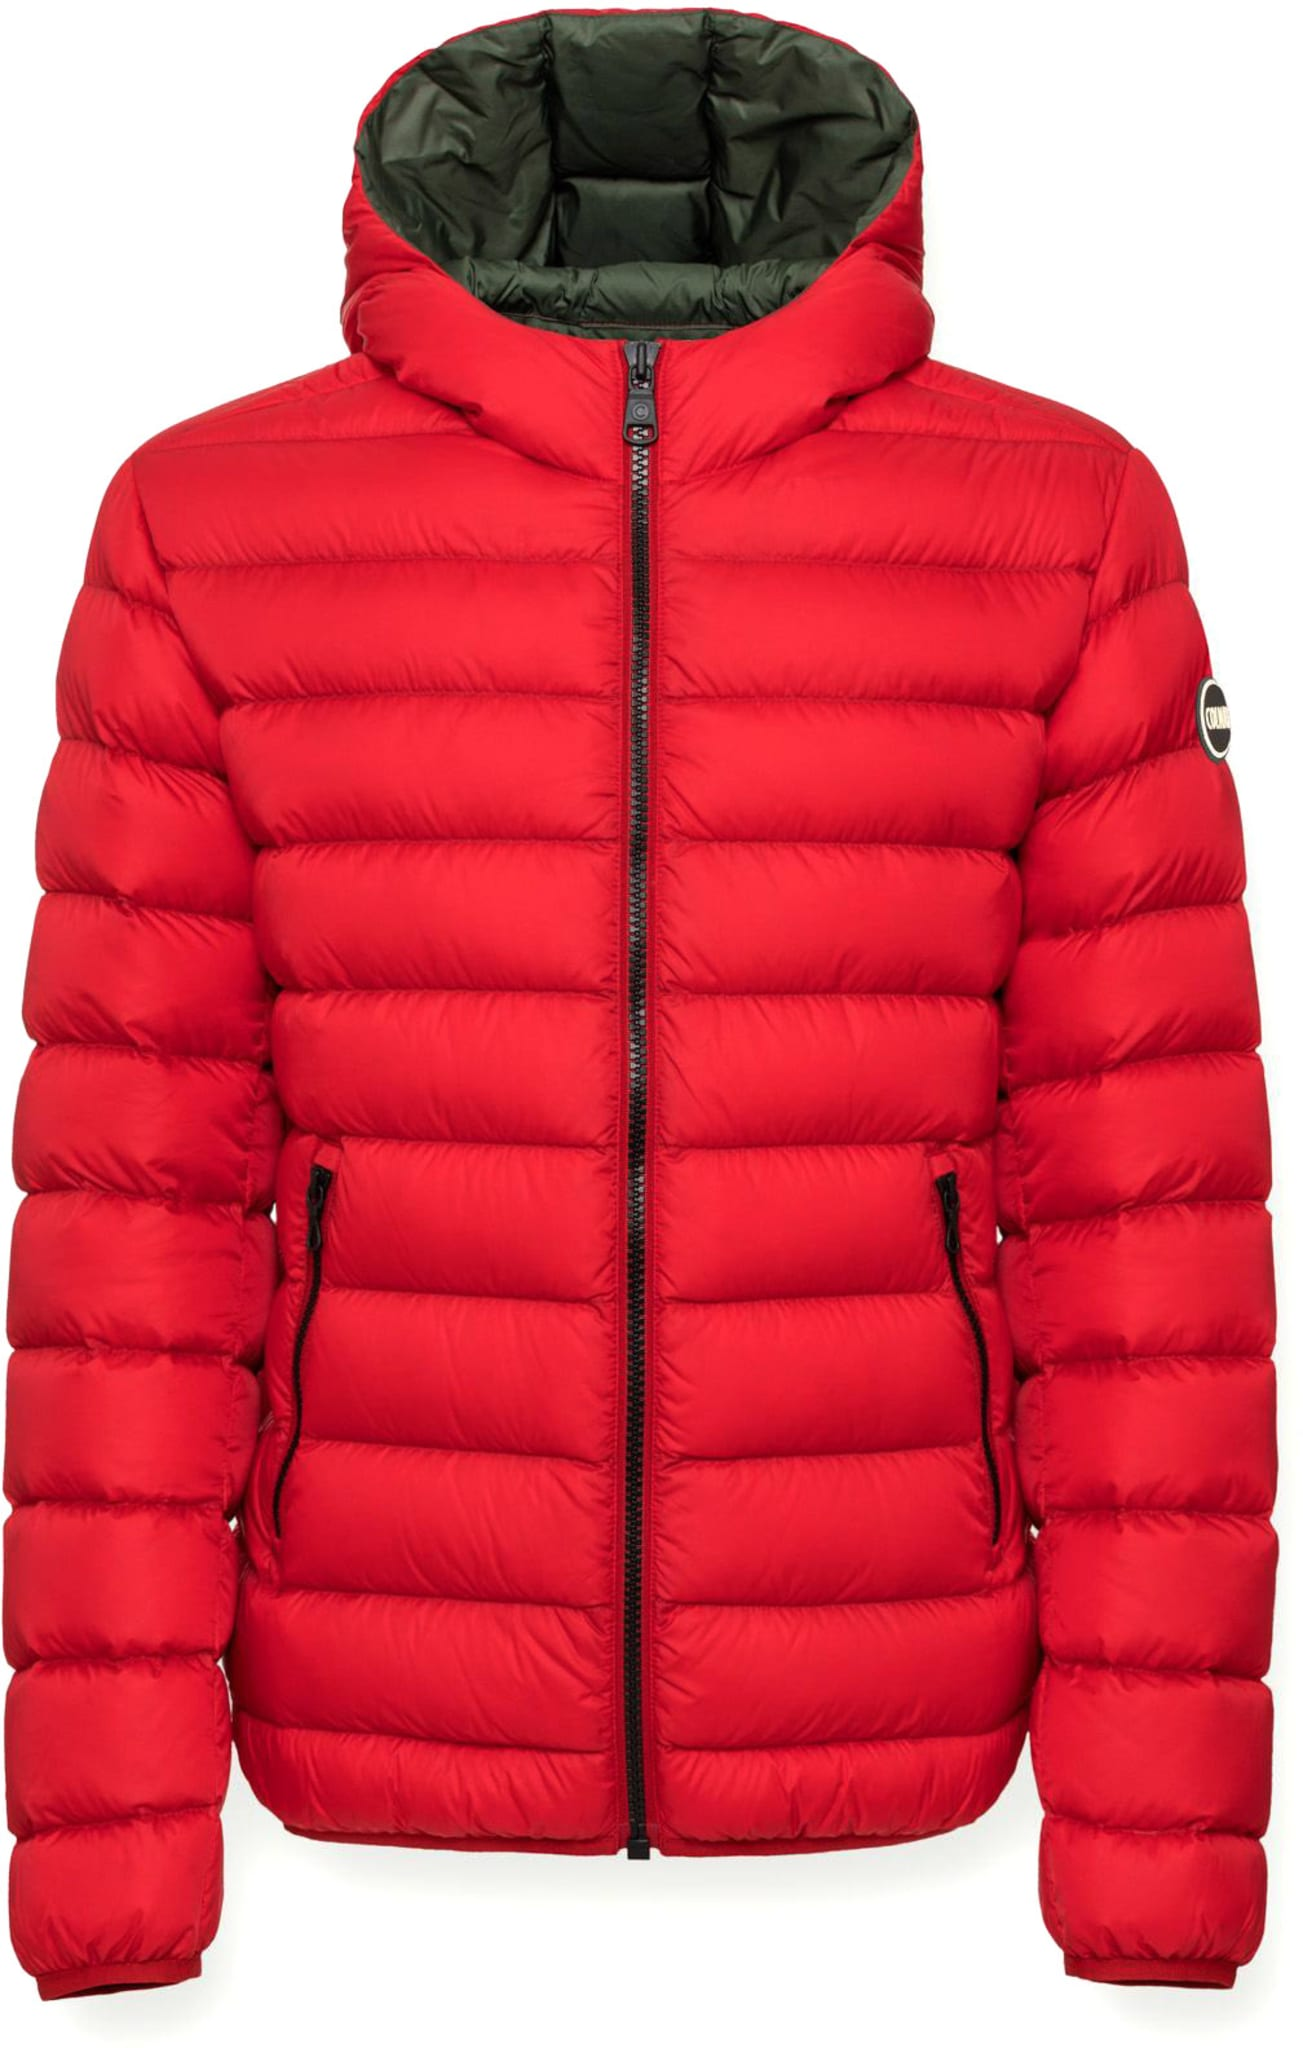 Orginals Winter Down Jacket M